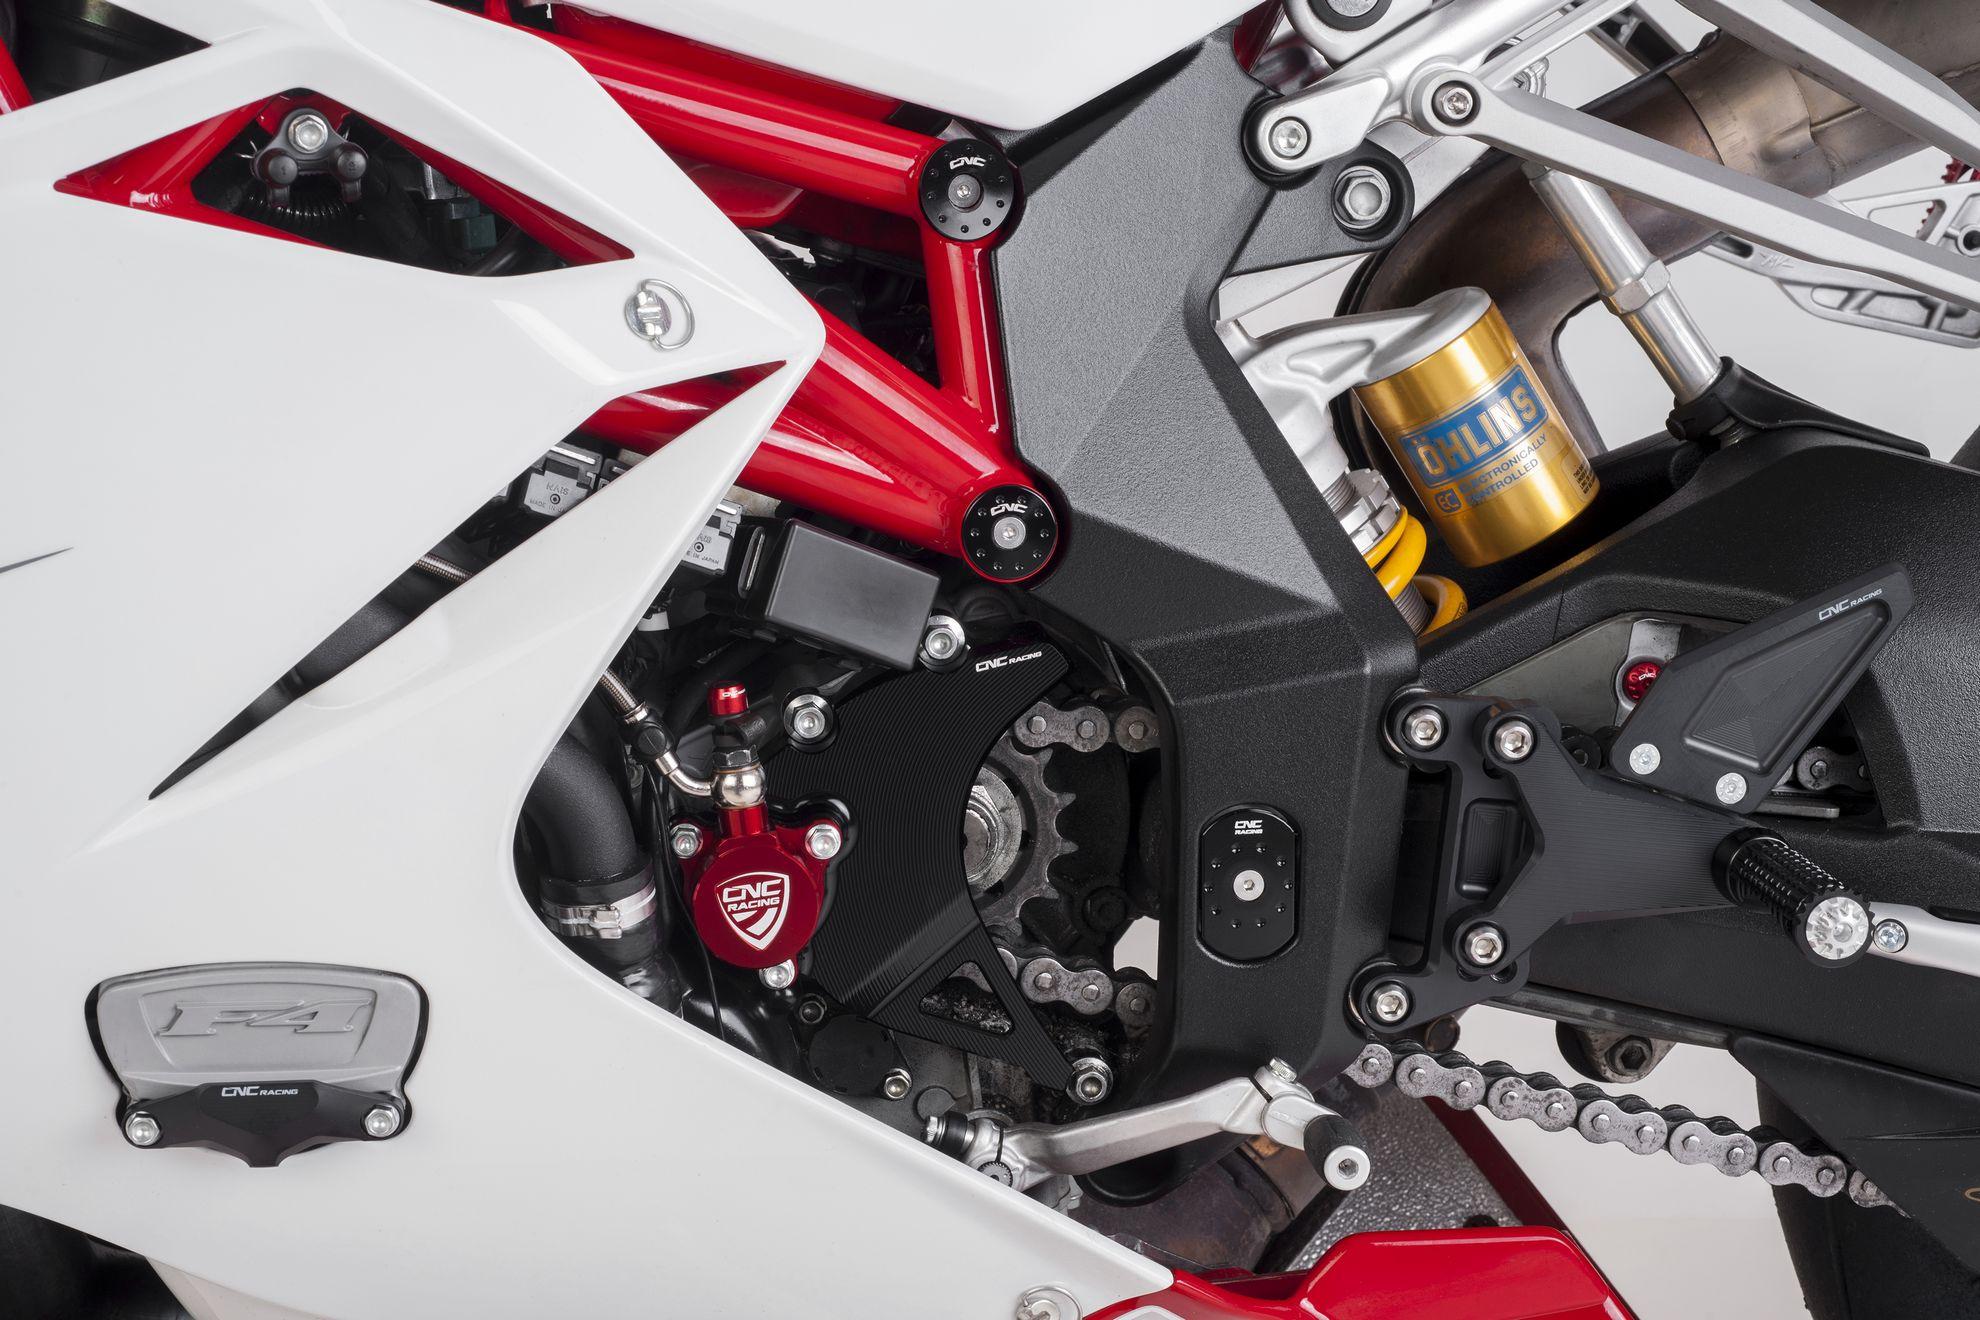 CNC Racing MV Agusta F4 Frame Cap Plugs 2010+